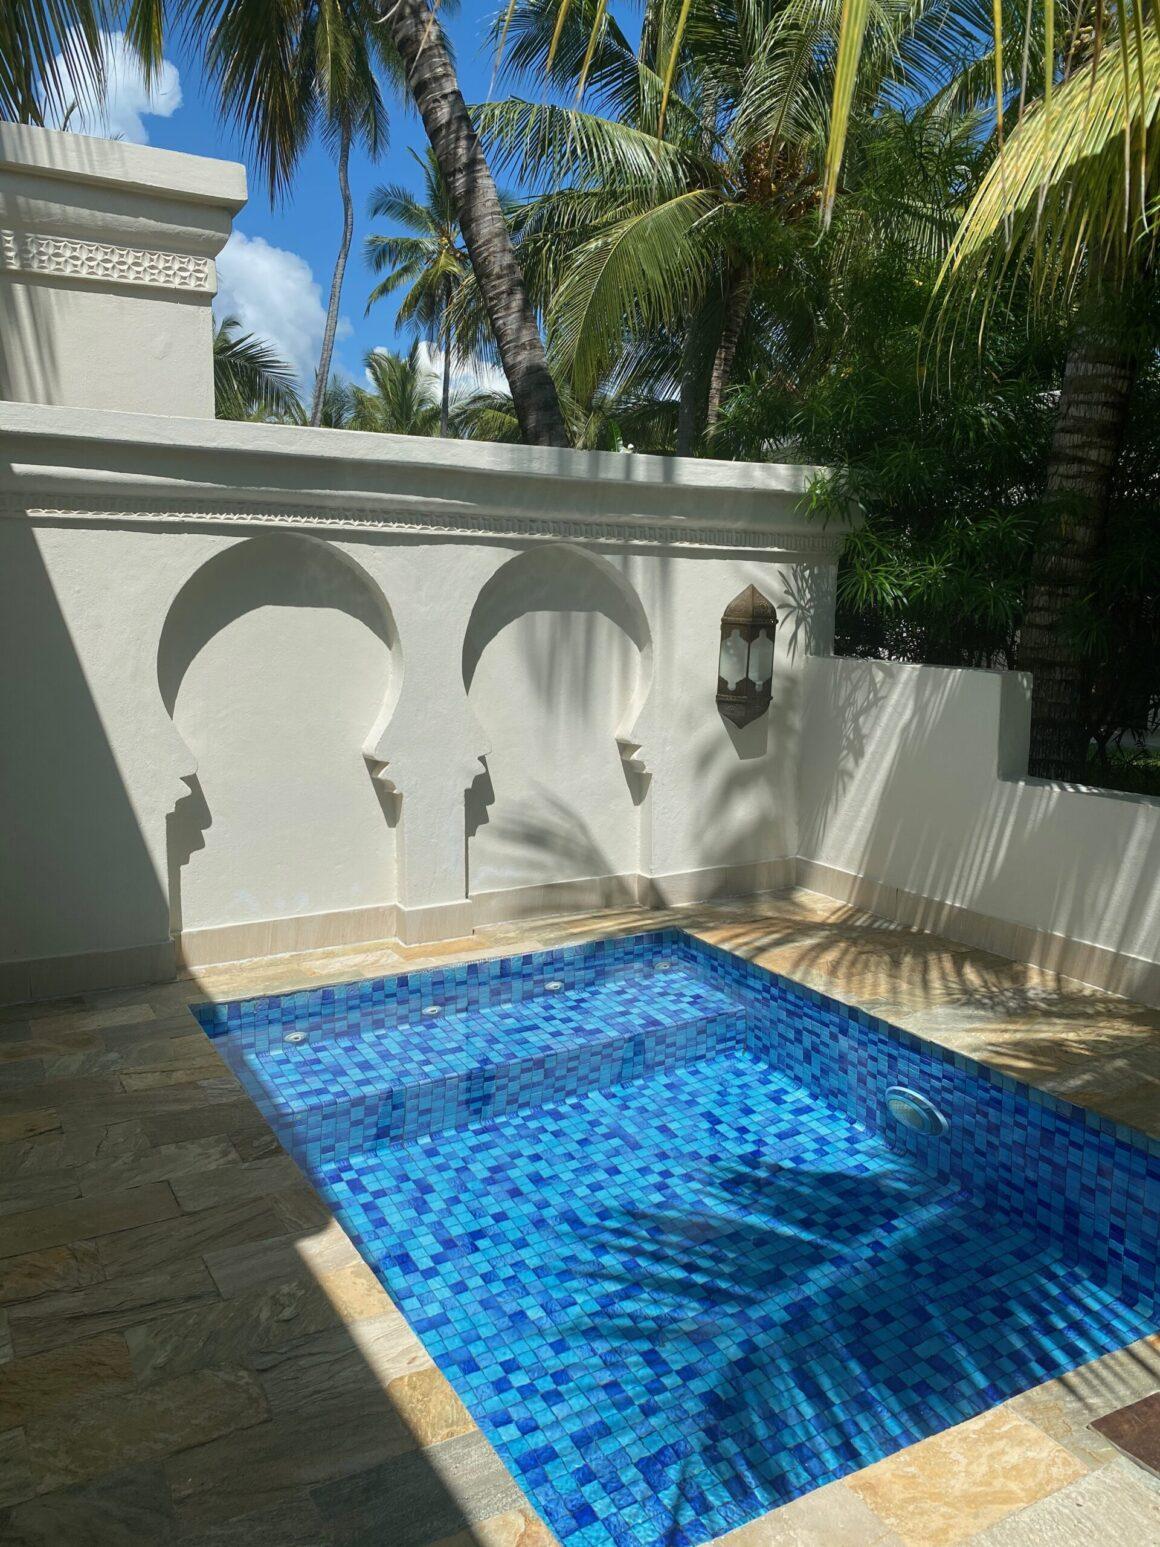 Baraza Resort plunge pool at room